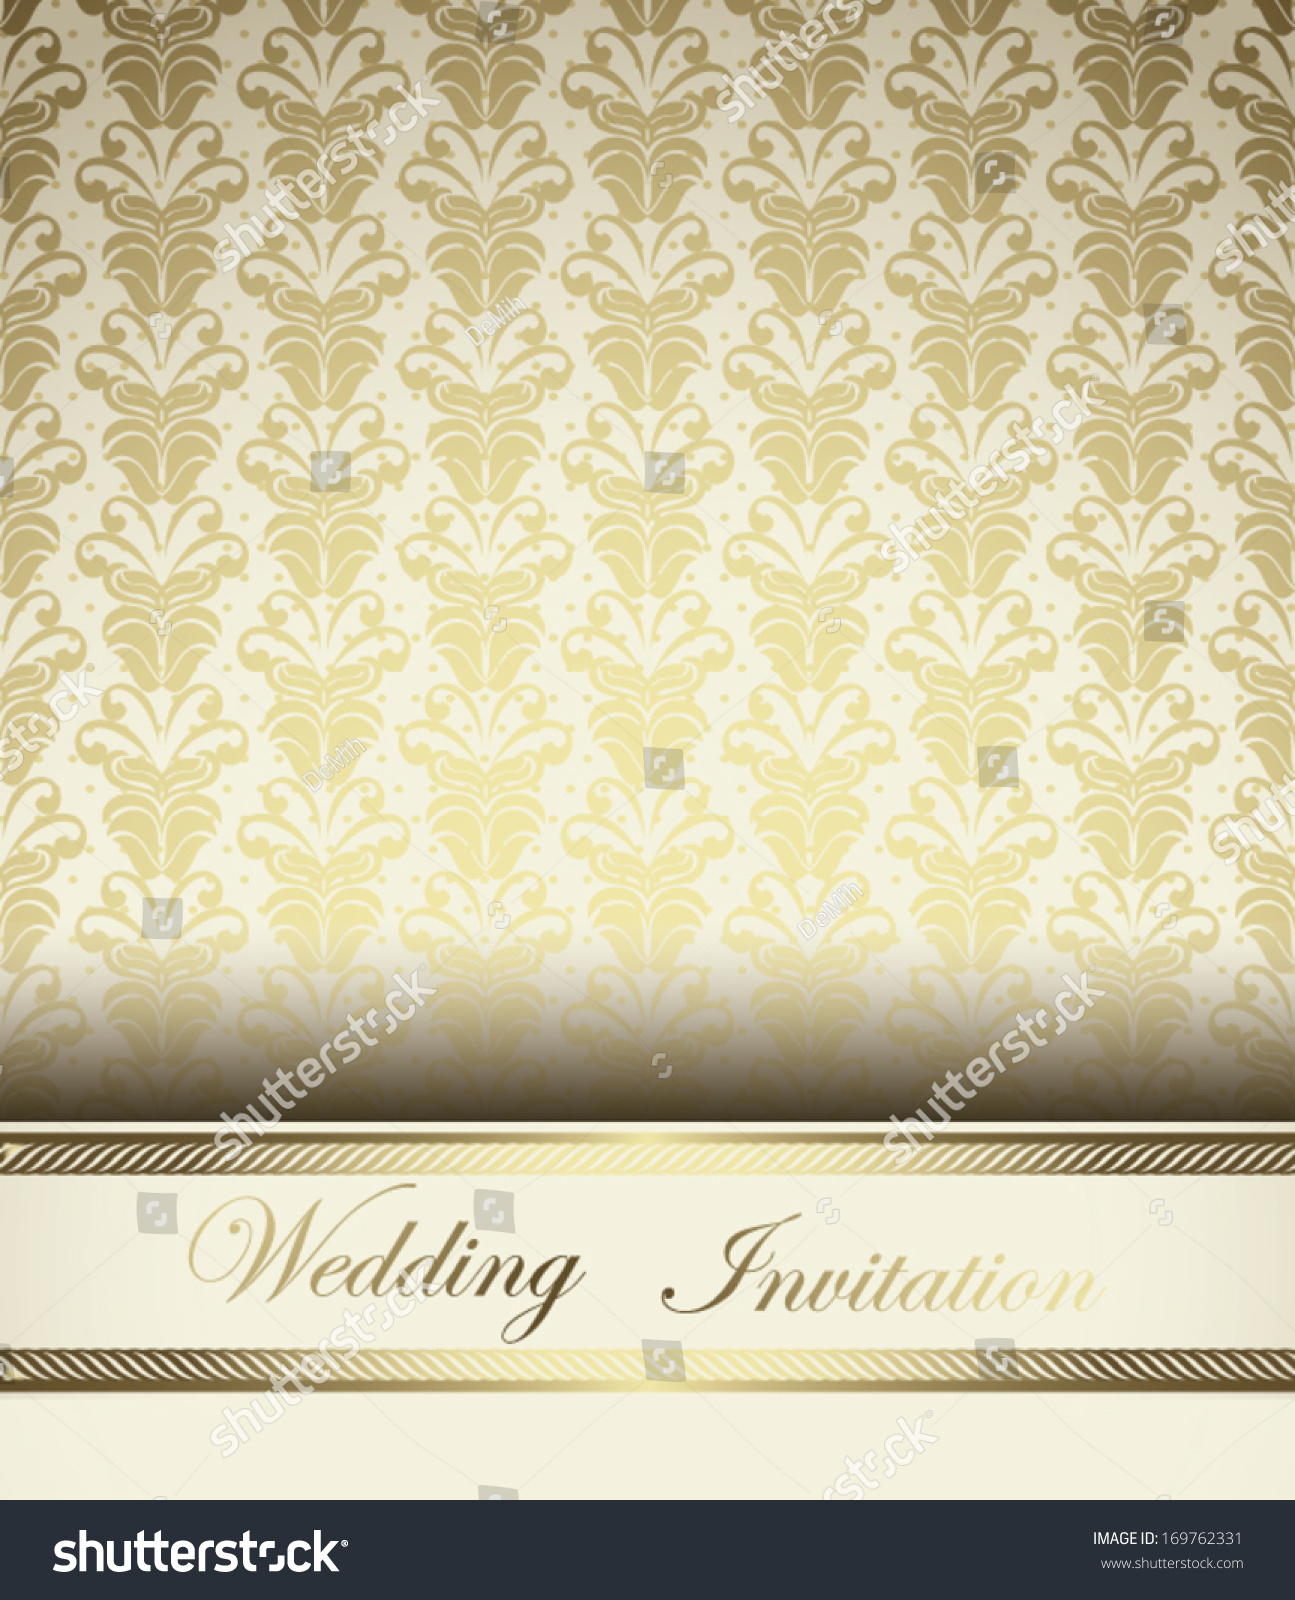 Golden Wedding Invitation Light Design Stock Vector 169762331 ...